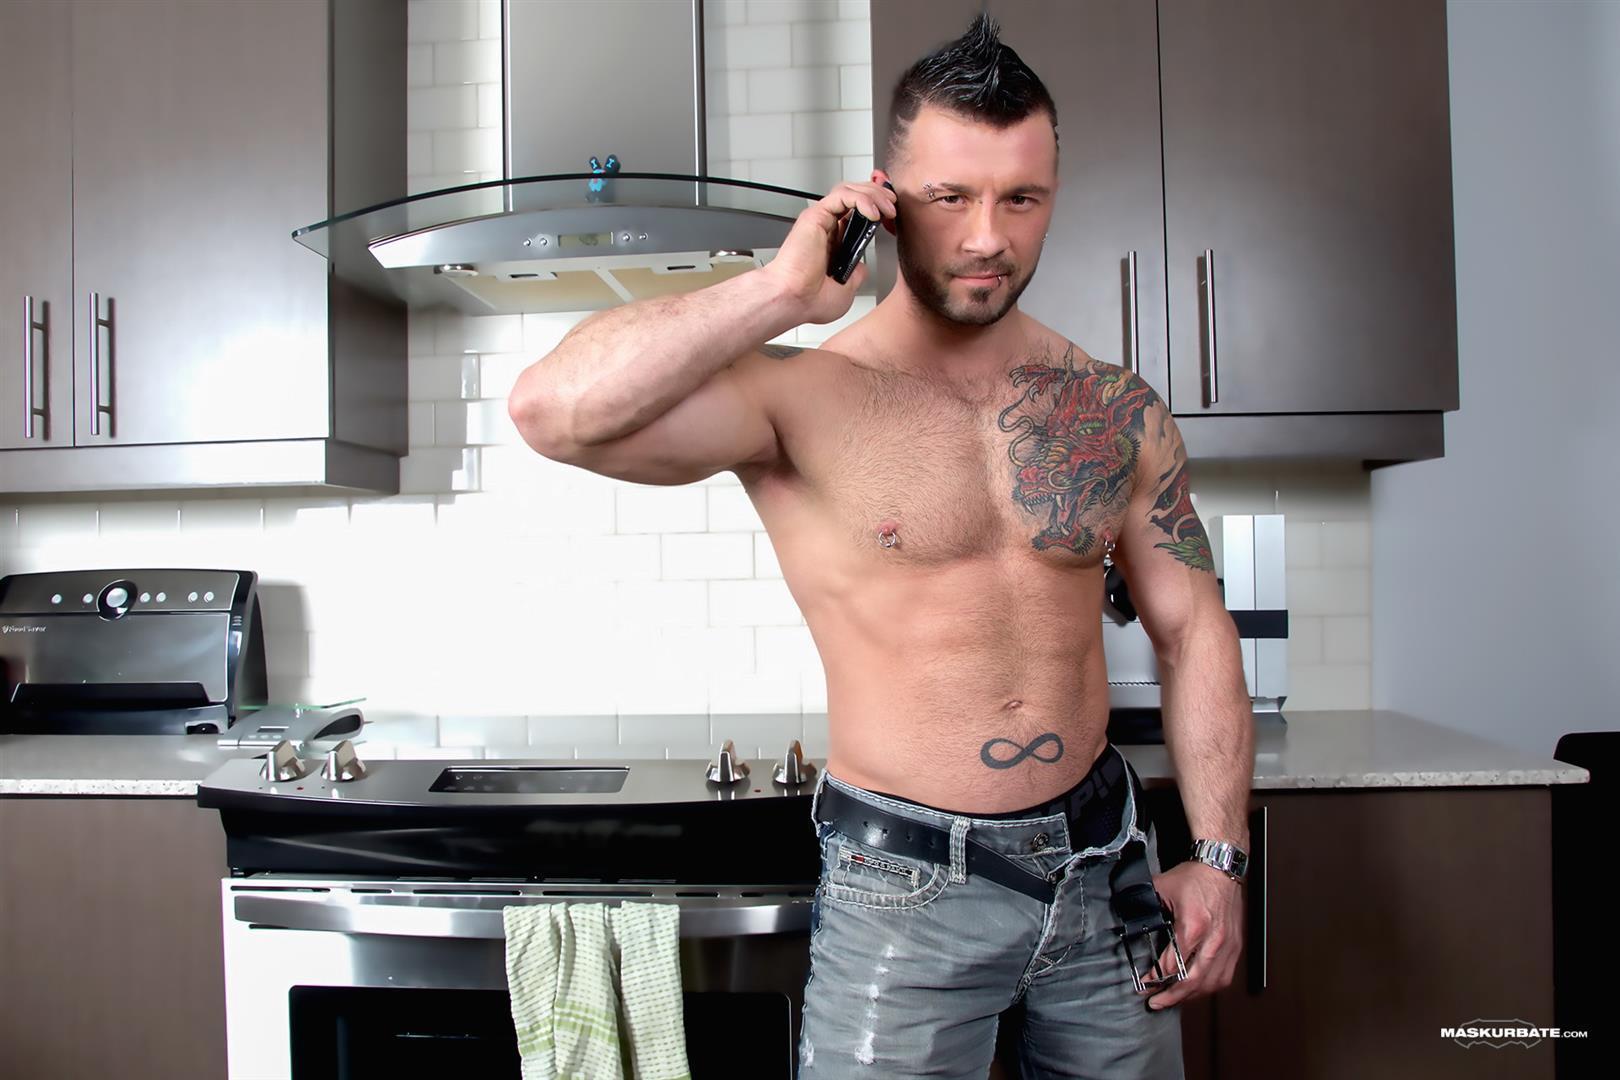 Maskurbate-Big-Uncut-Cock-Manuel-Deboxer-Latino-Getting-Two-Big-Black-Cocks-Up-The-Ass-Amateur-Gay-Porn-01.jpg